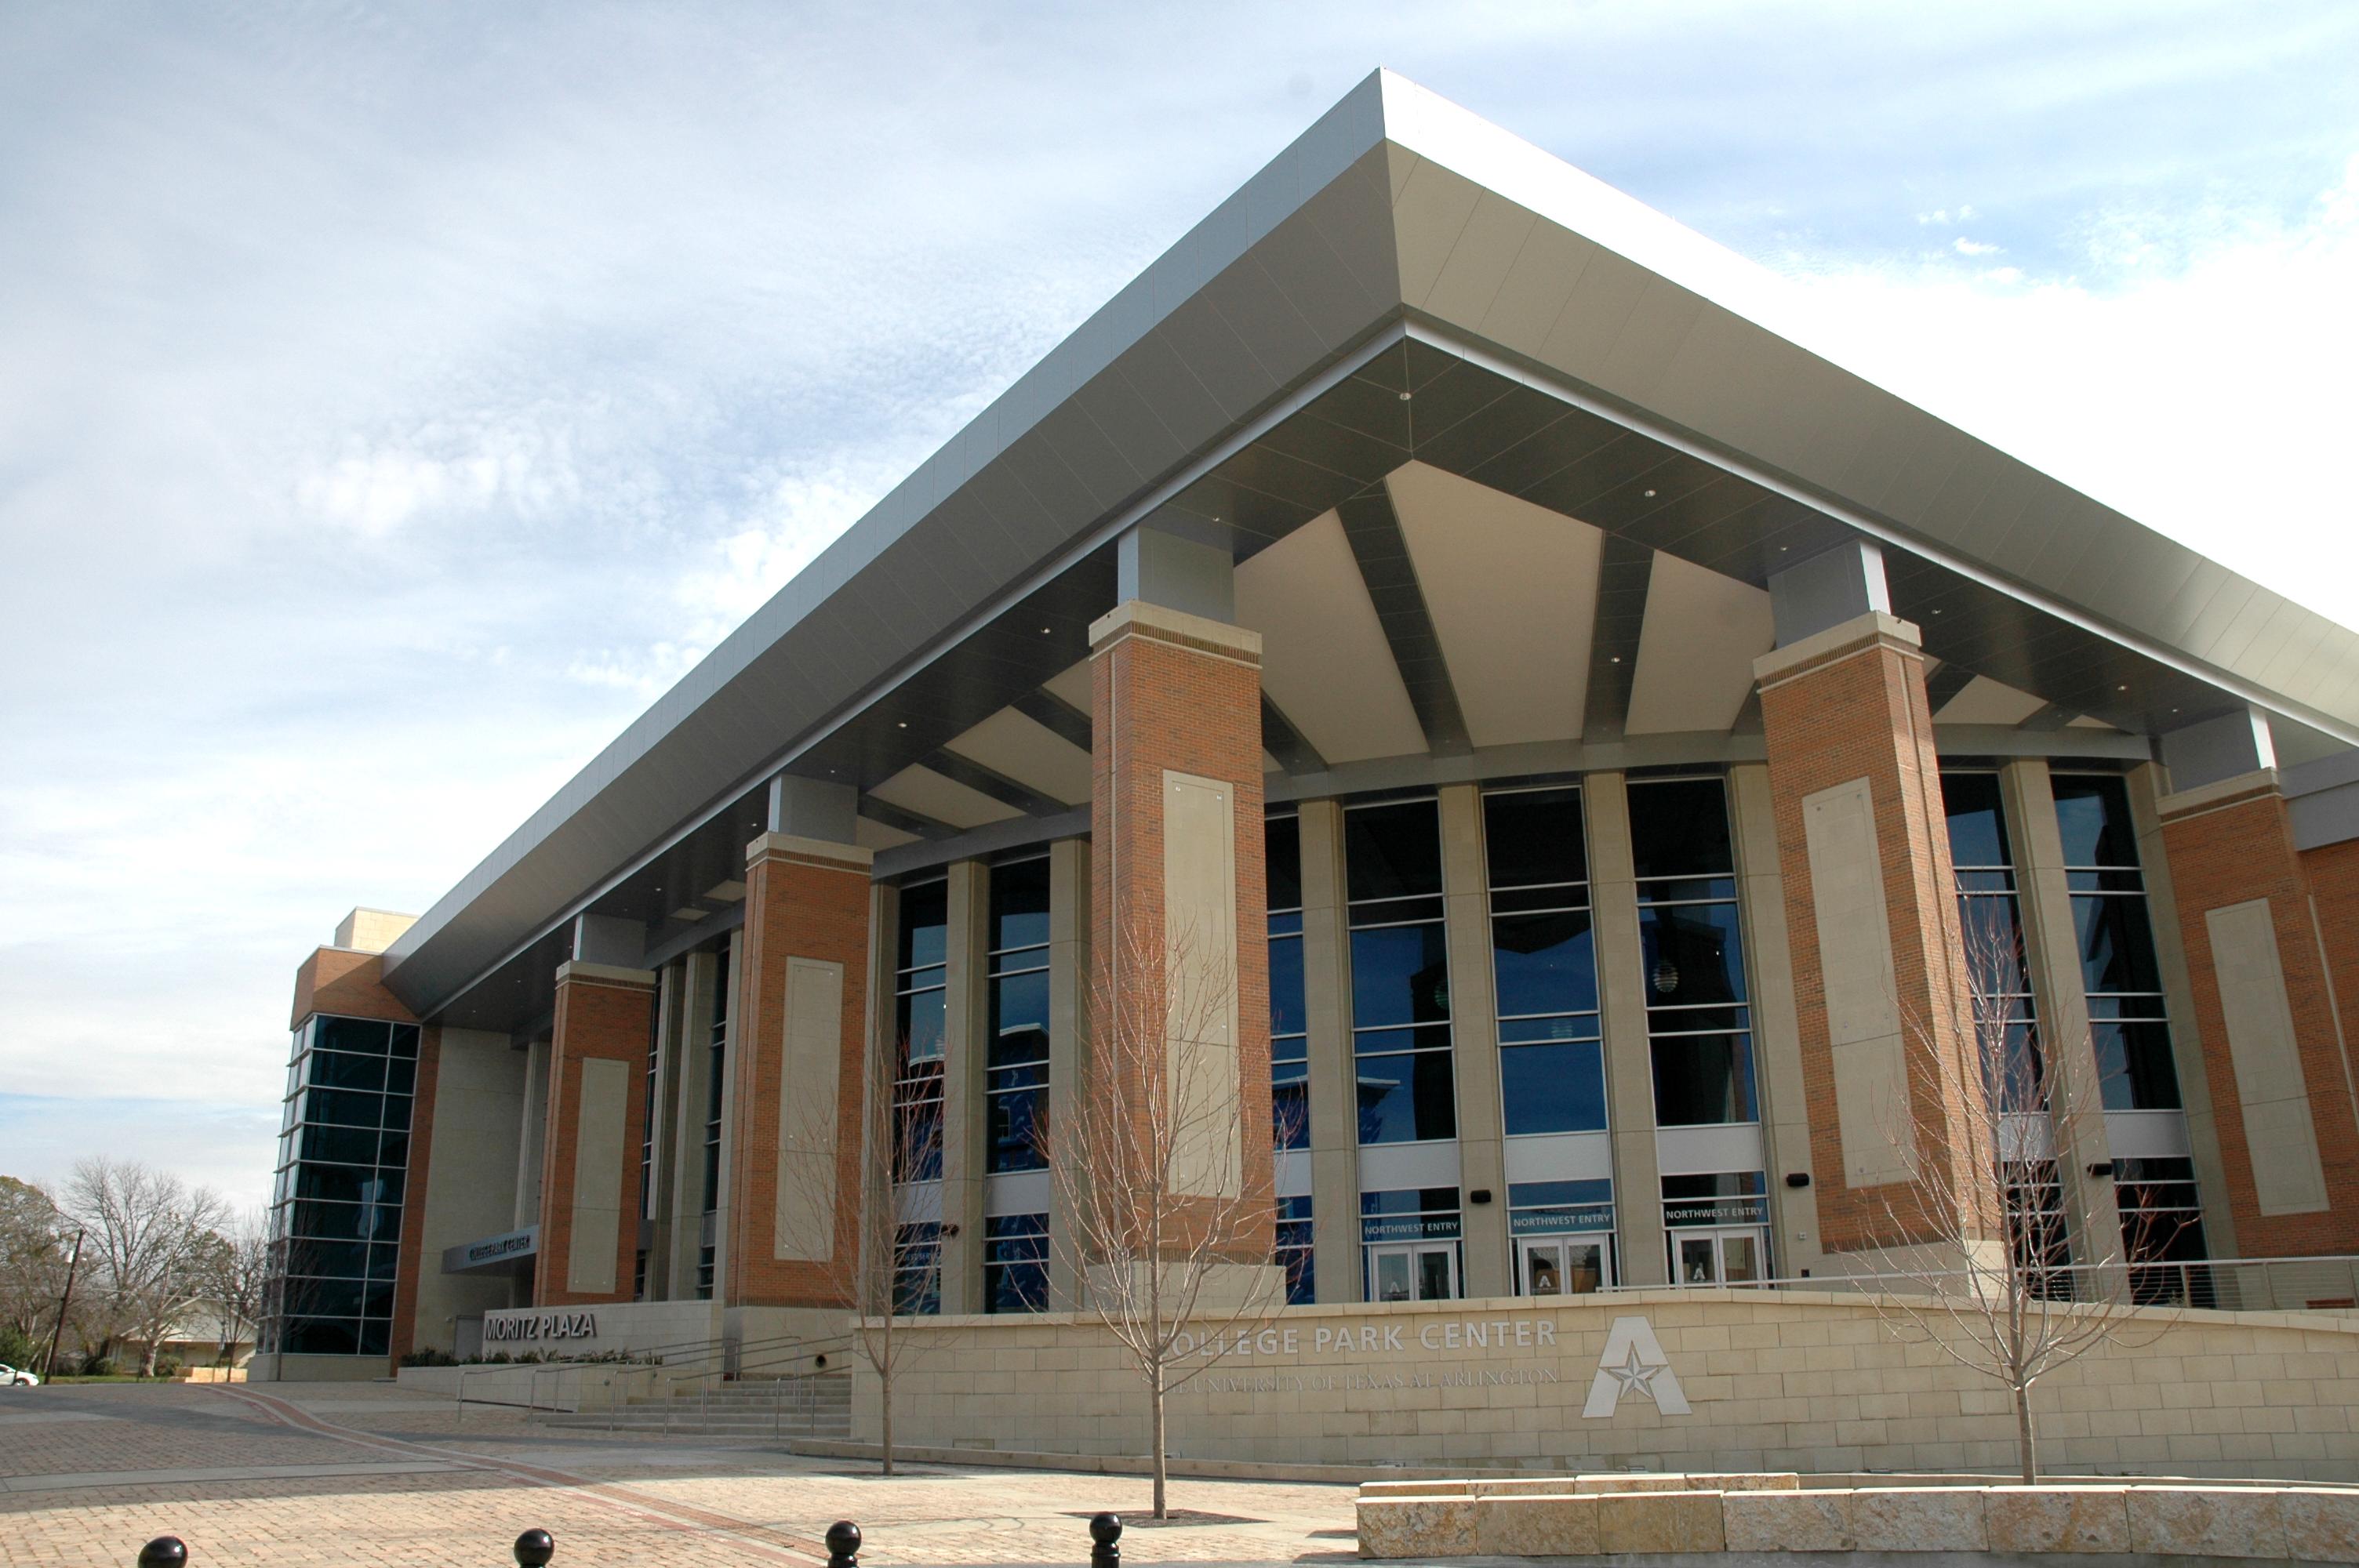 image of University of Texas at Arlington